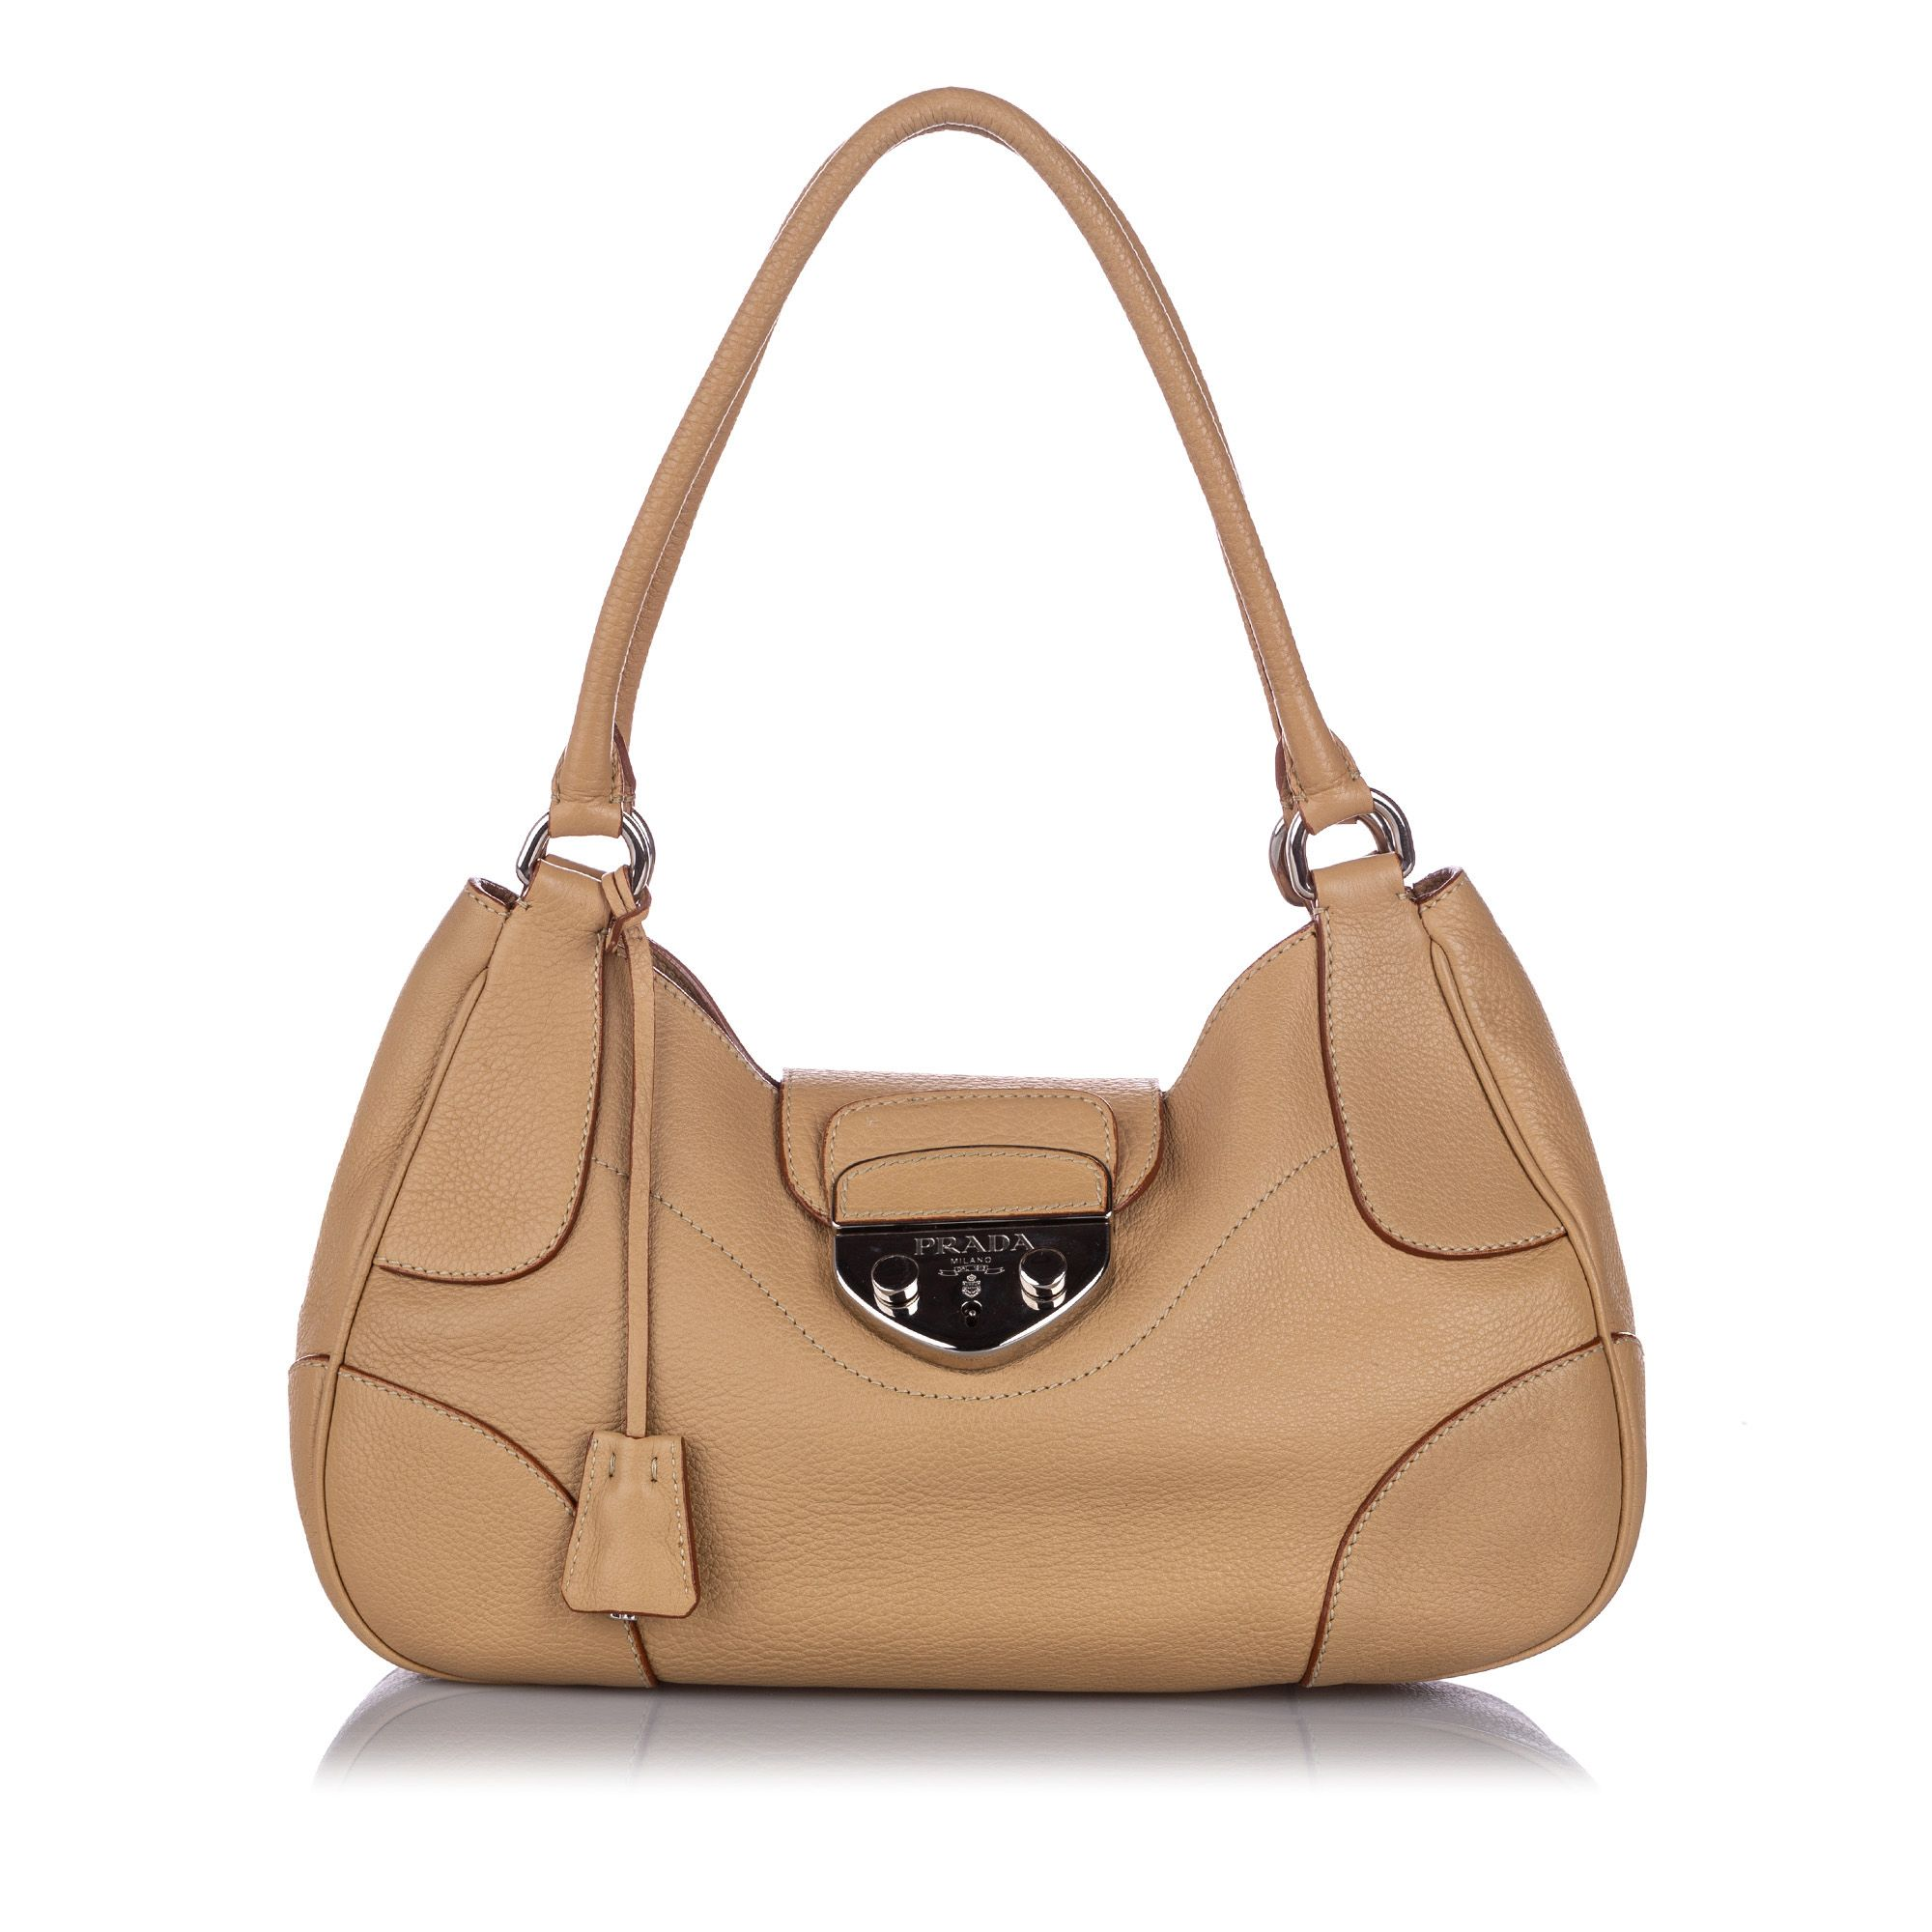 Vintage Prada Vitello Daino Shoulder Bag Brown